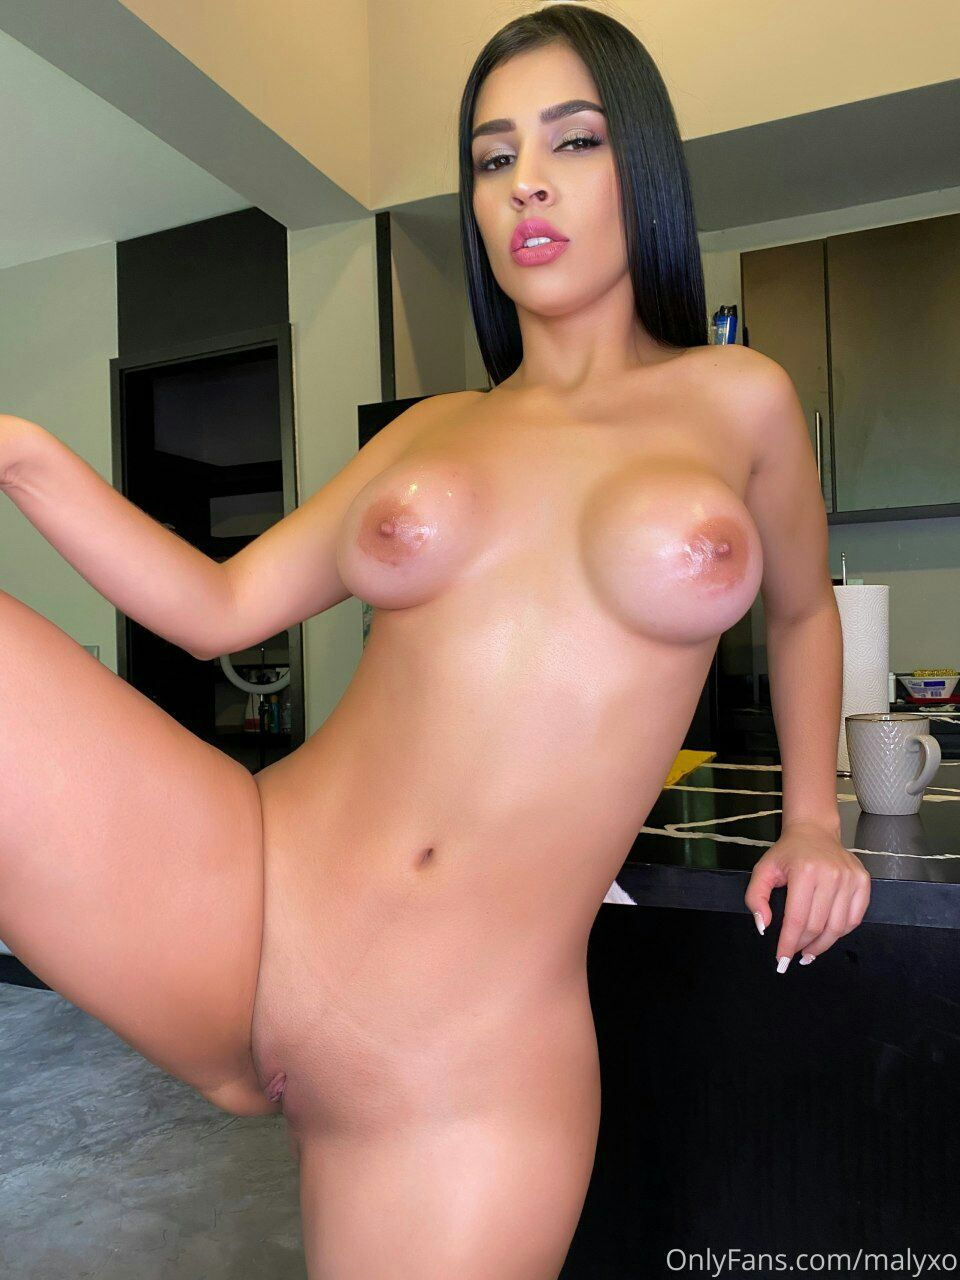 Malyxo, fotos de onlyfans, chicas desnudas